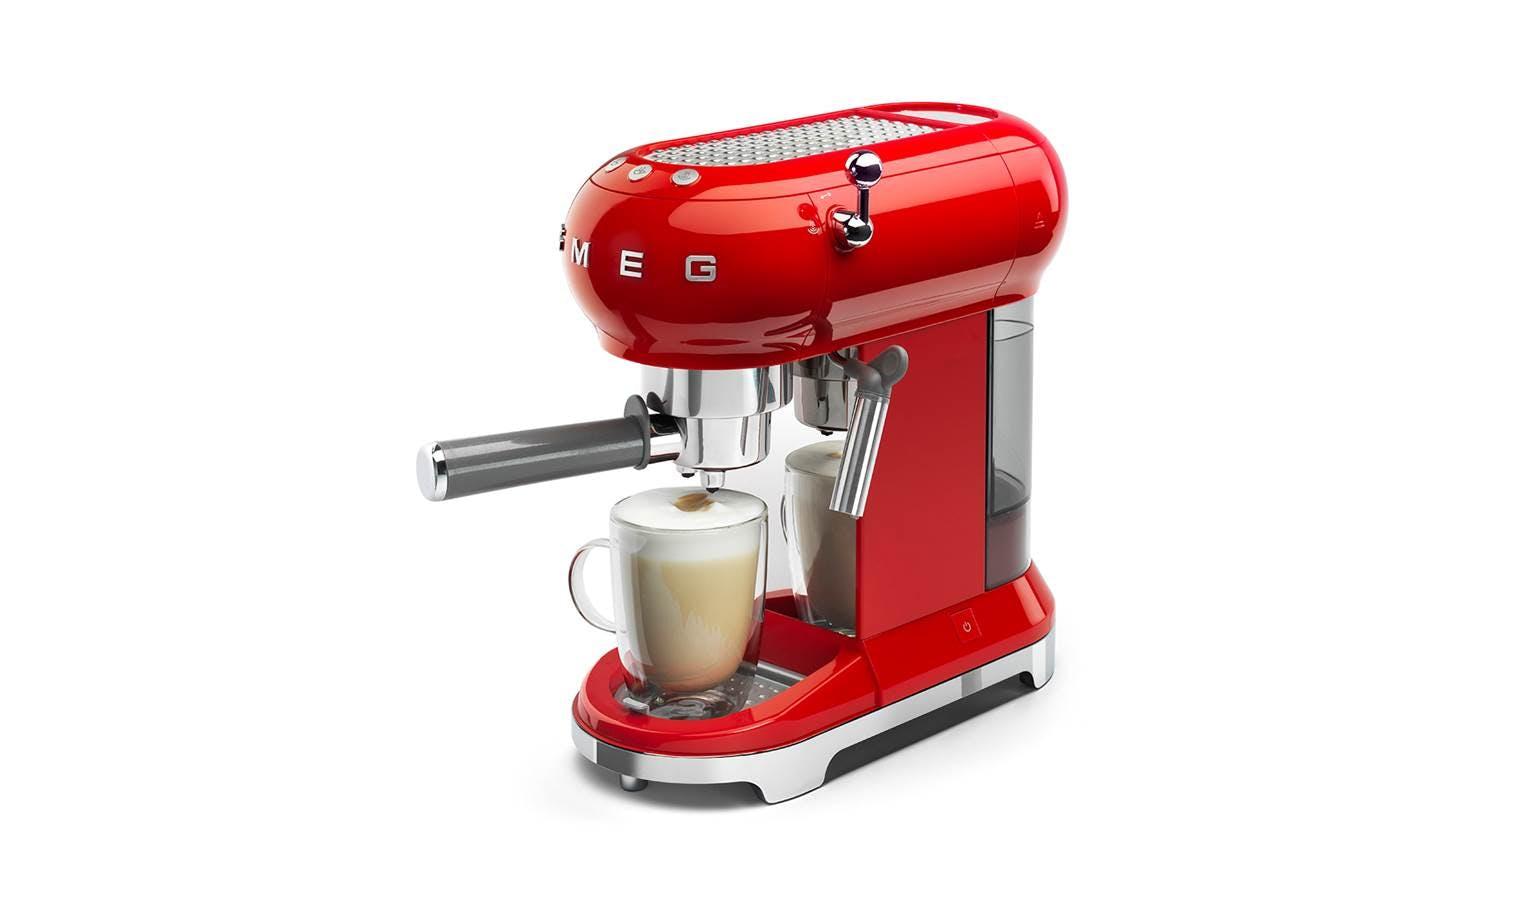 Smeg 50's Retro Style Aesthetic Espresso Coffee Machine